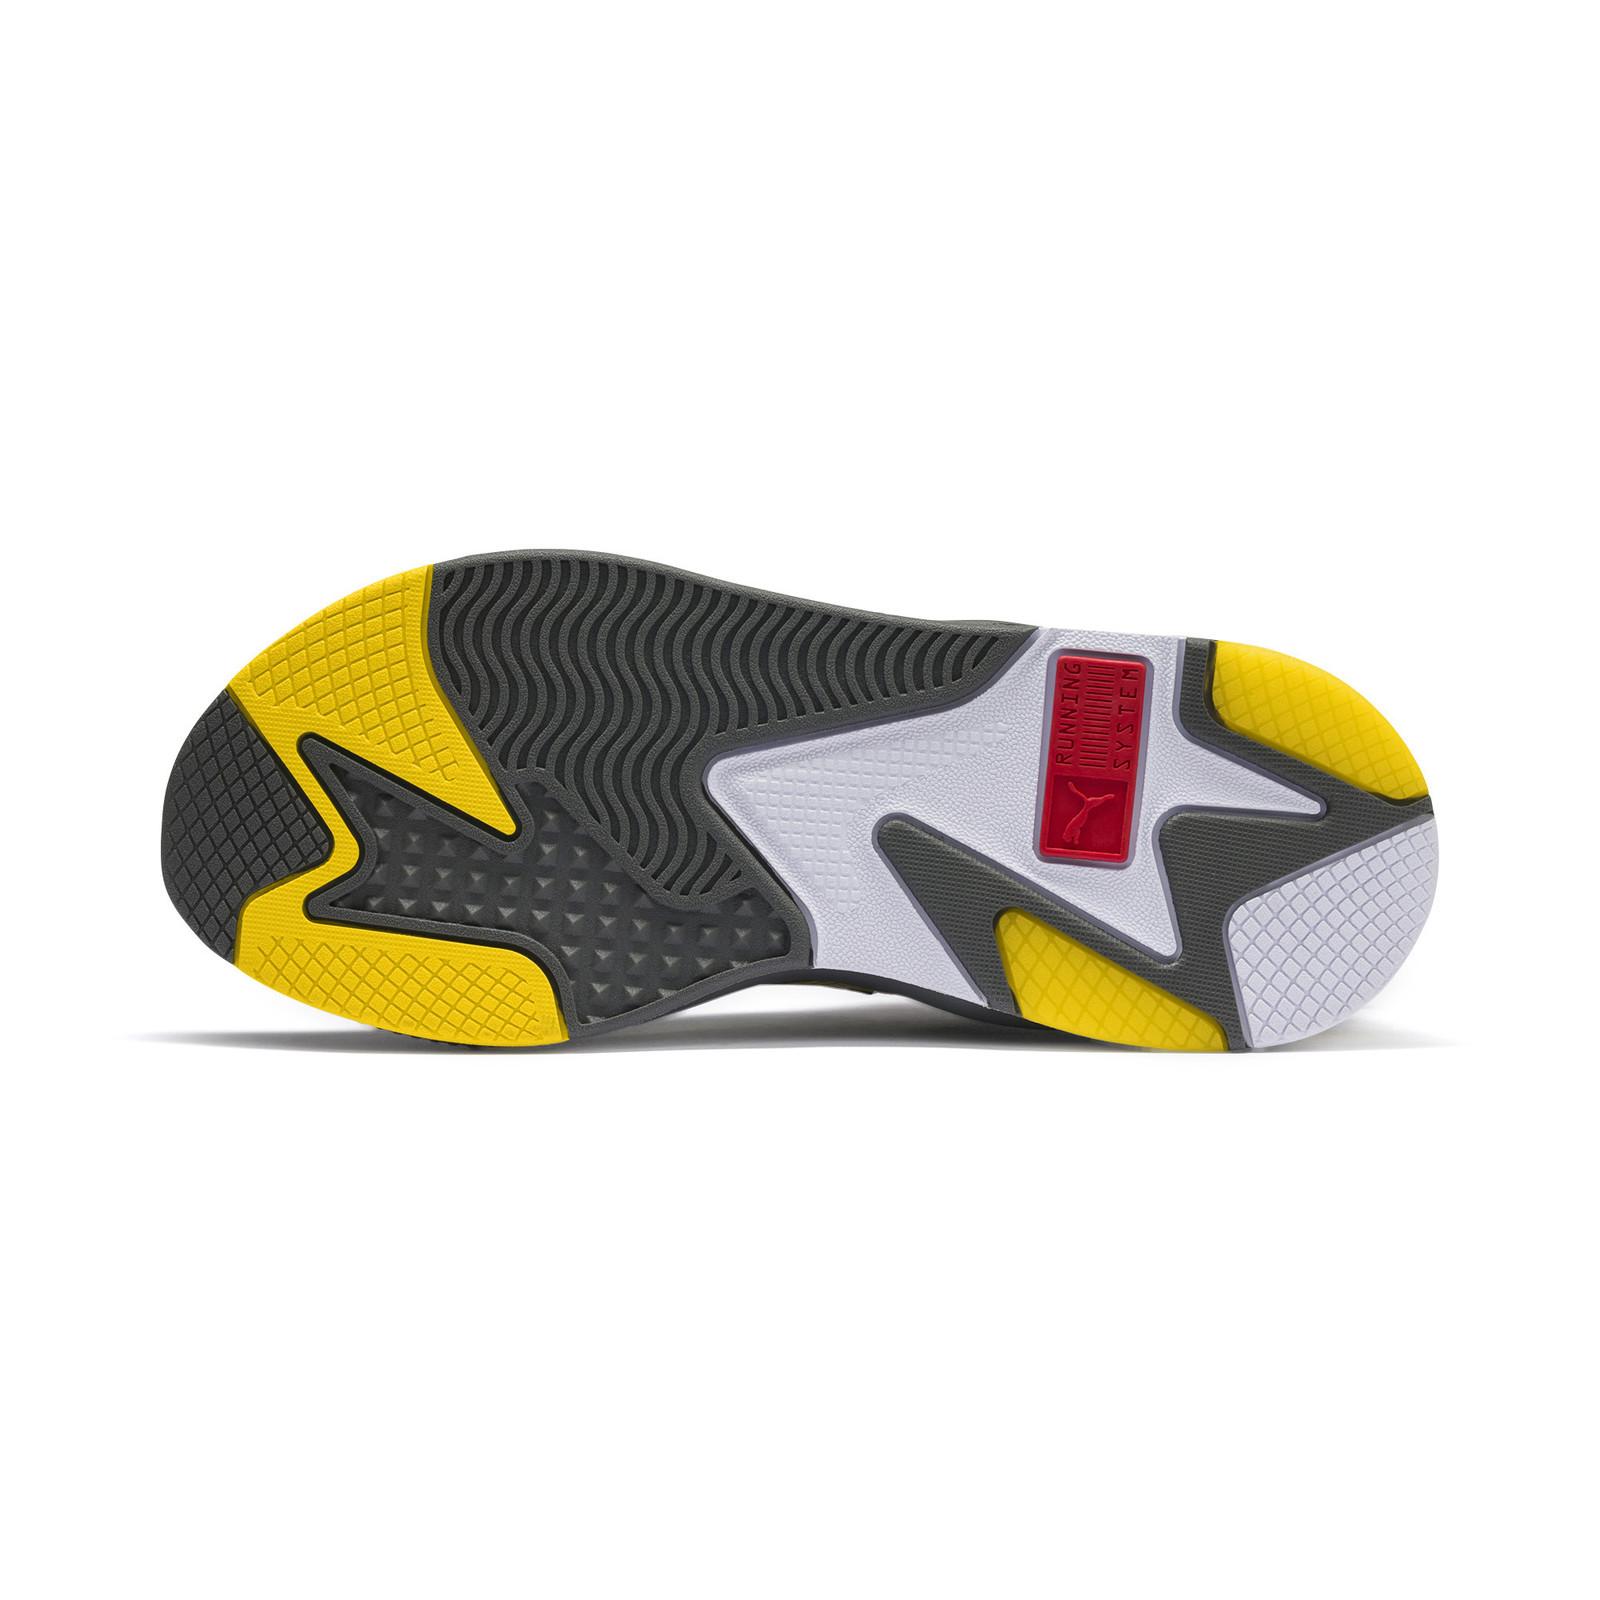 Puma RS X Transformers Bumblebee 370701 02